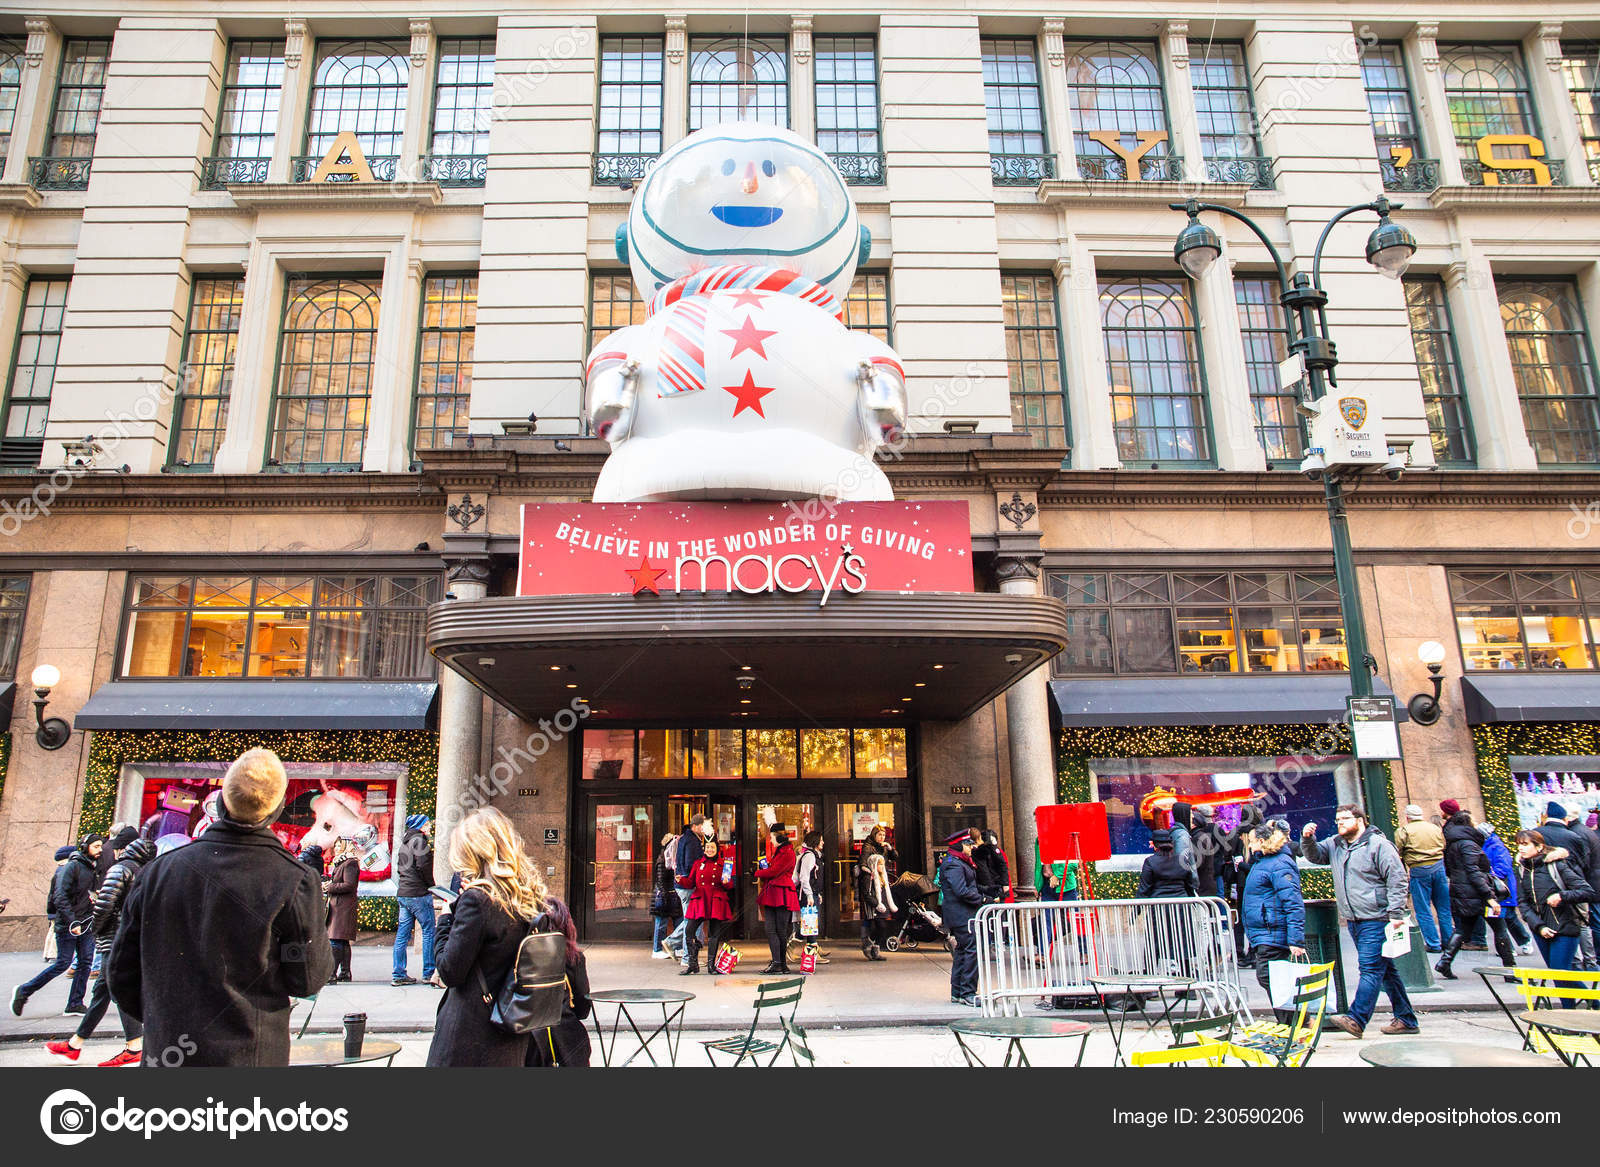 fb60ba68598 Nova York Dezembro 2018 Natal Cena Rua Nova York Loja — Fotografia de Stock